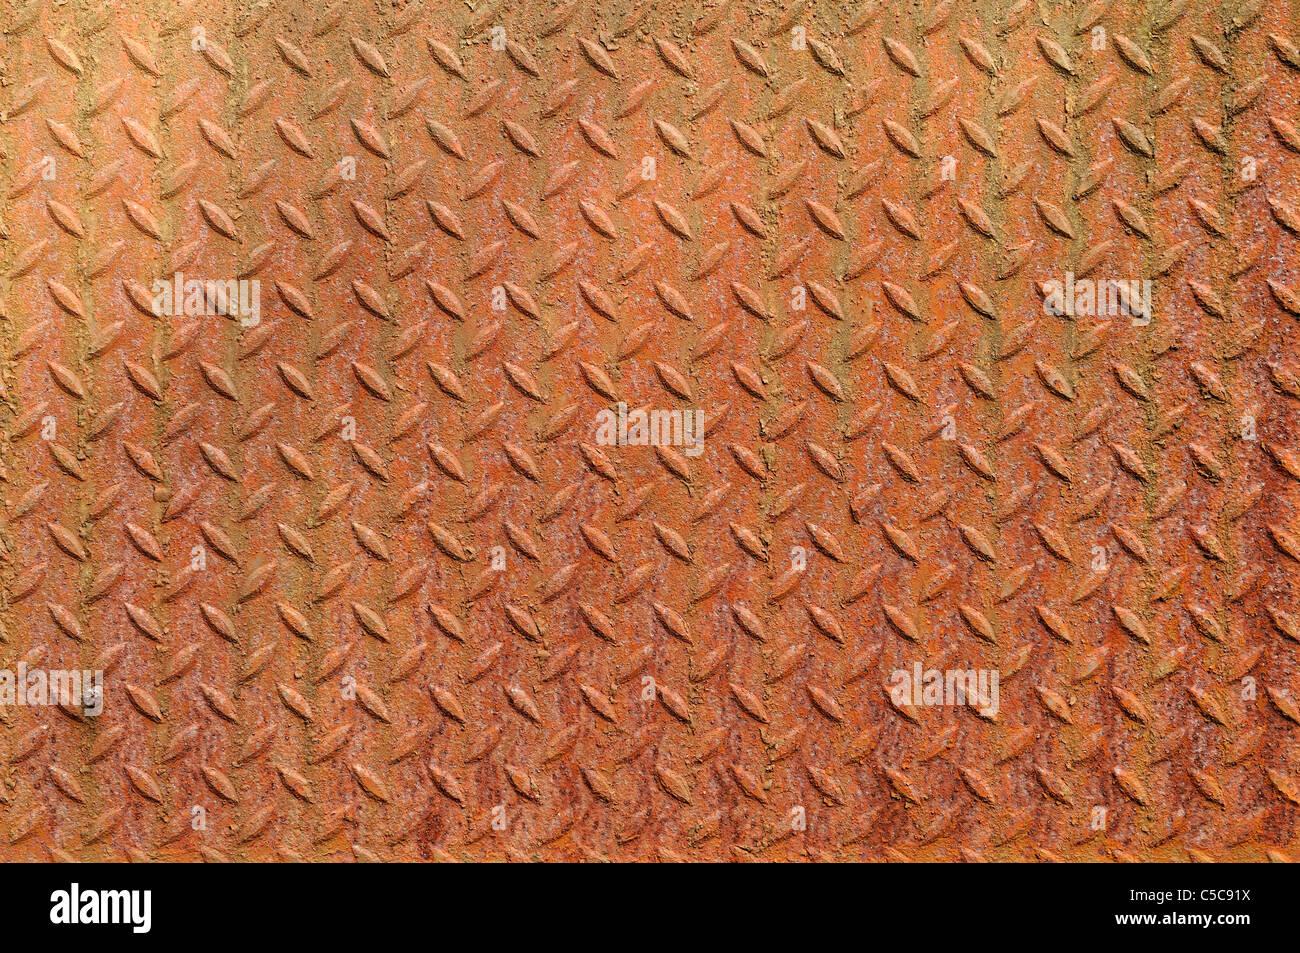 Texture of a grunge metal diamond plate. - Stock Image